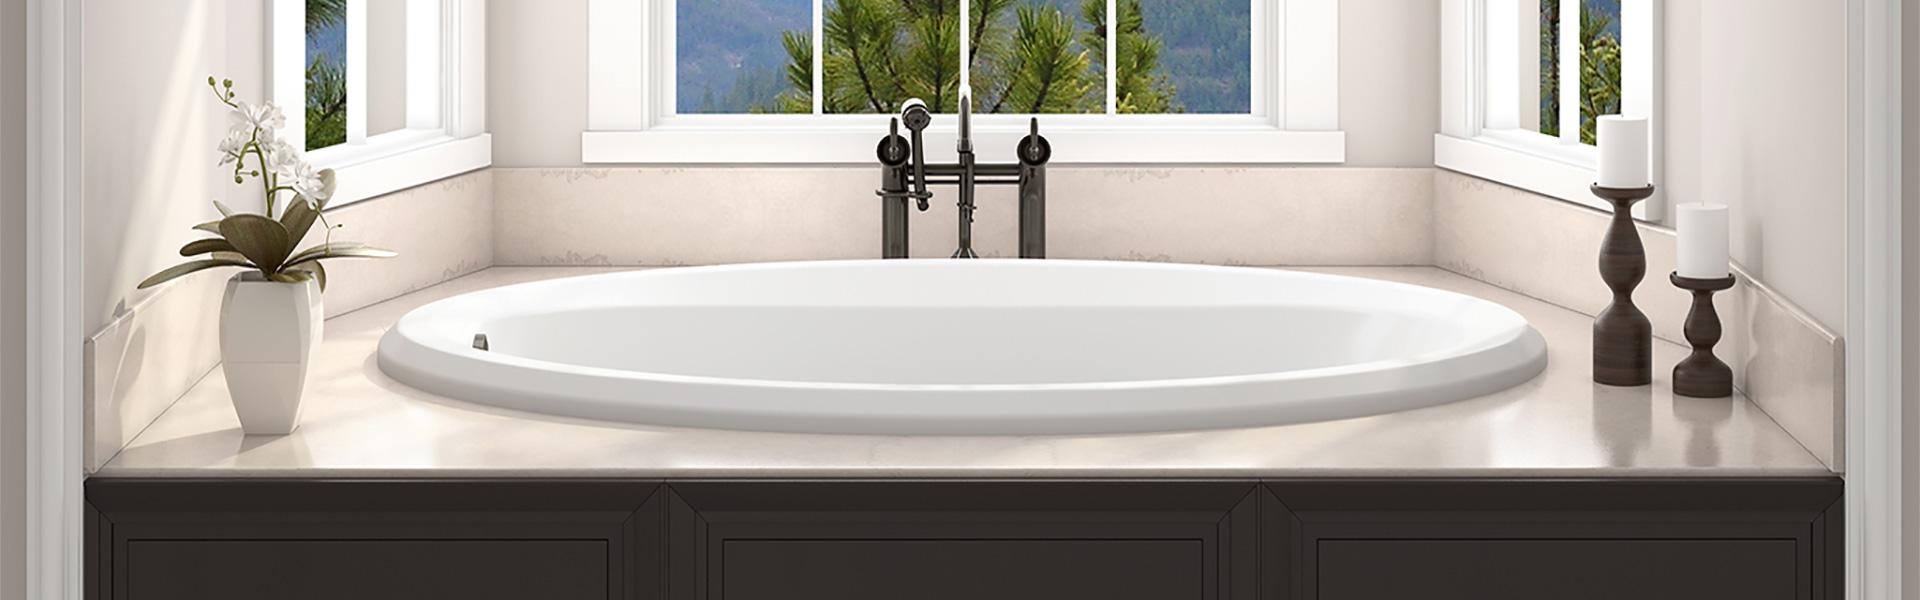 1920x600-jacuzzi-whirlpool-signature-bath - JJ Pool & Spa